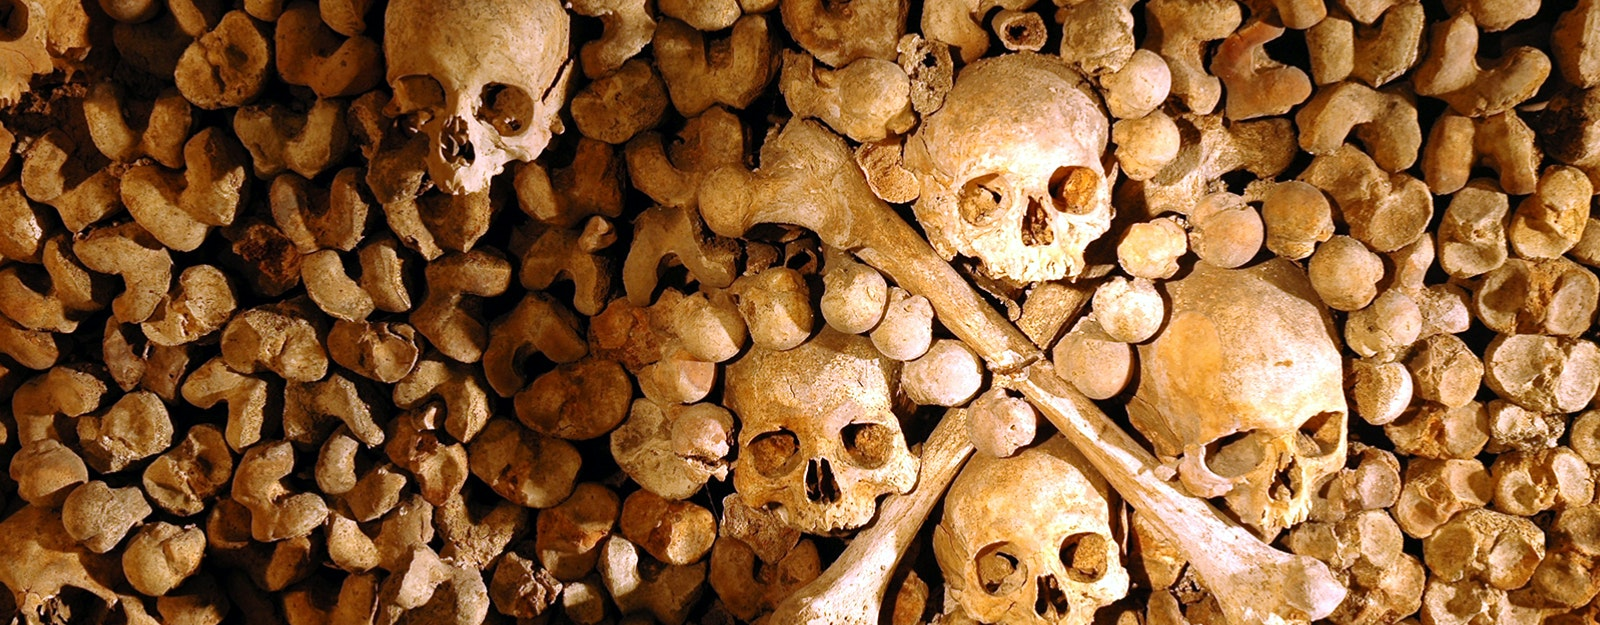 Paris Skip The Line Tickets - Catacombs